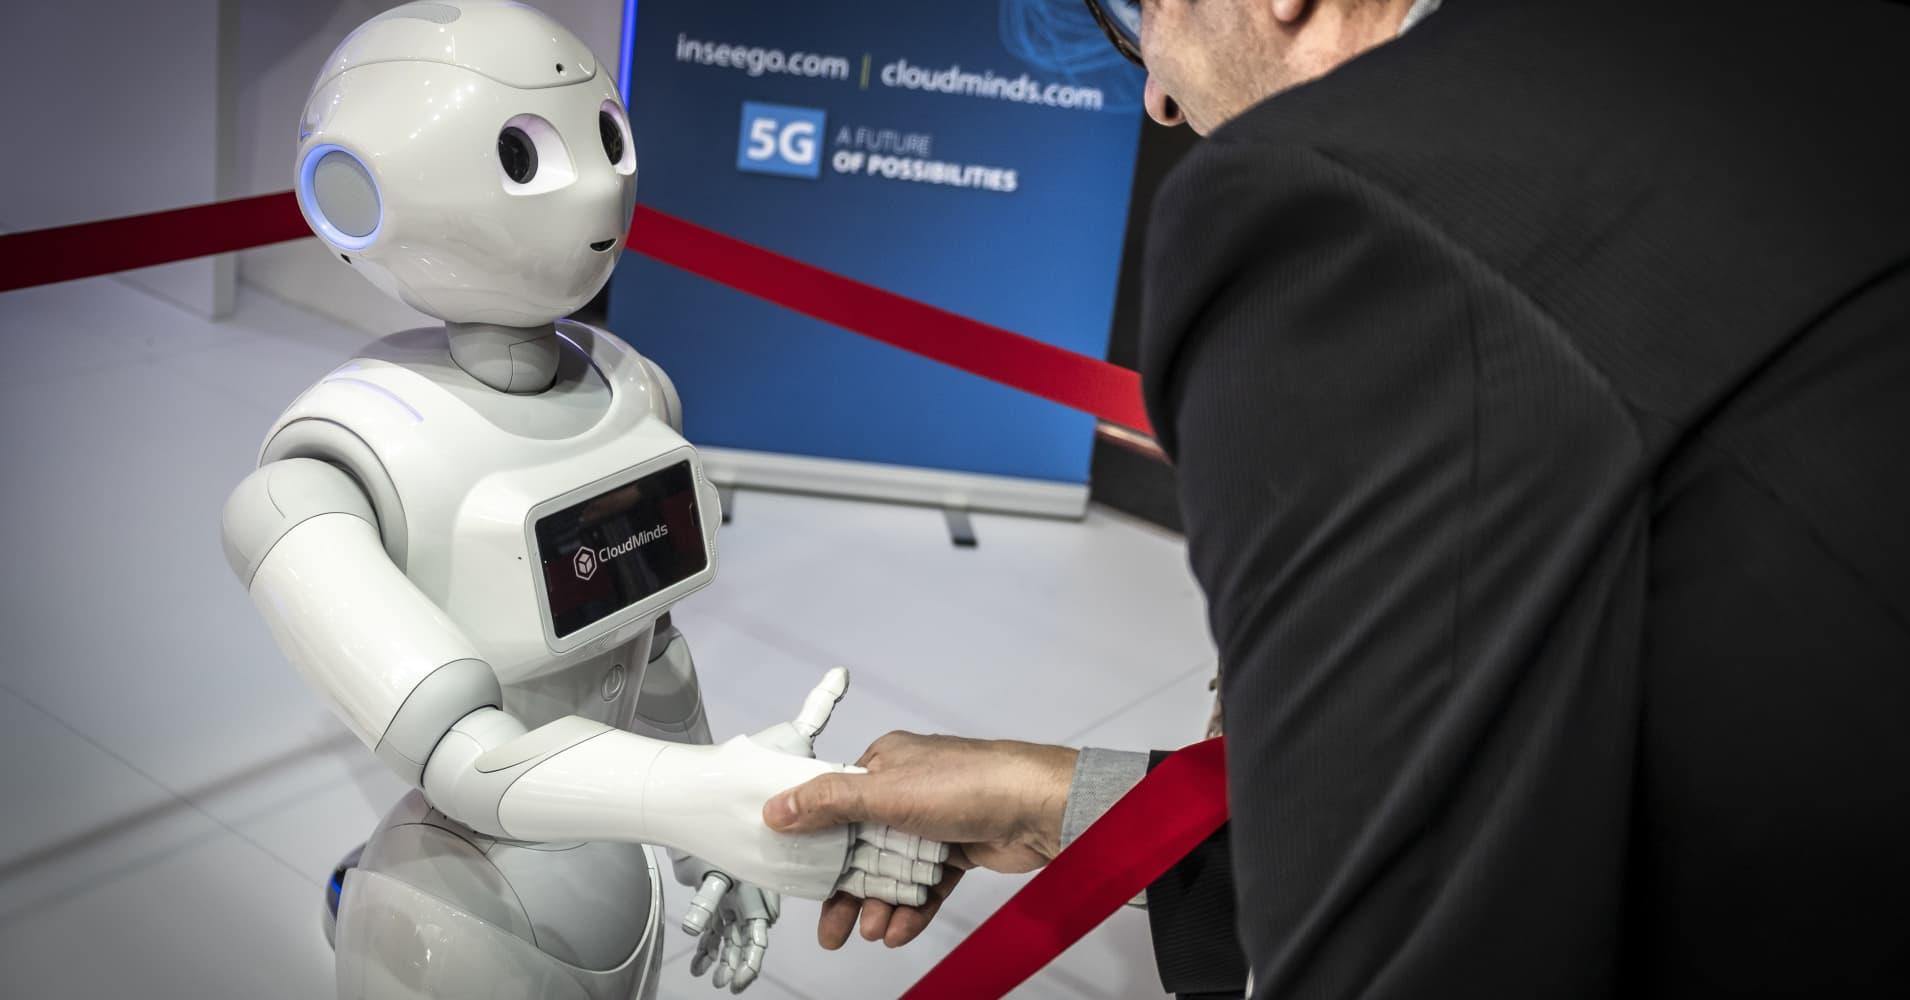 Salesforce chief scientist Richard Socher on challenges, future of AI